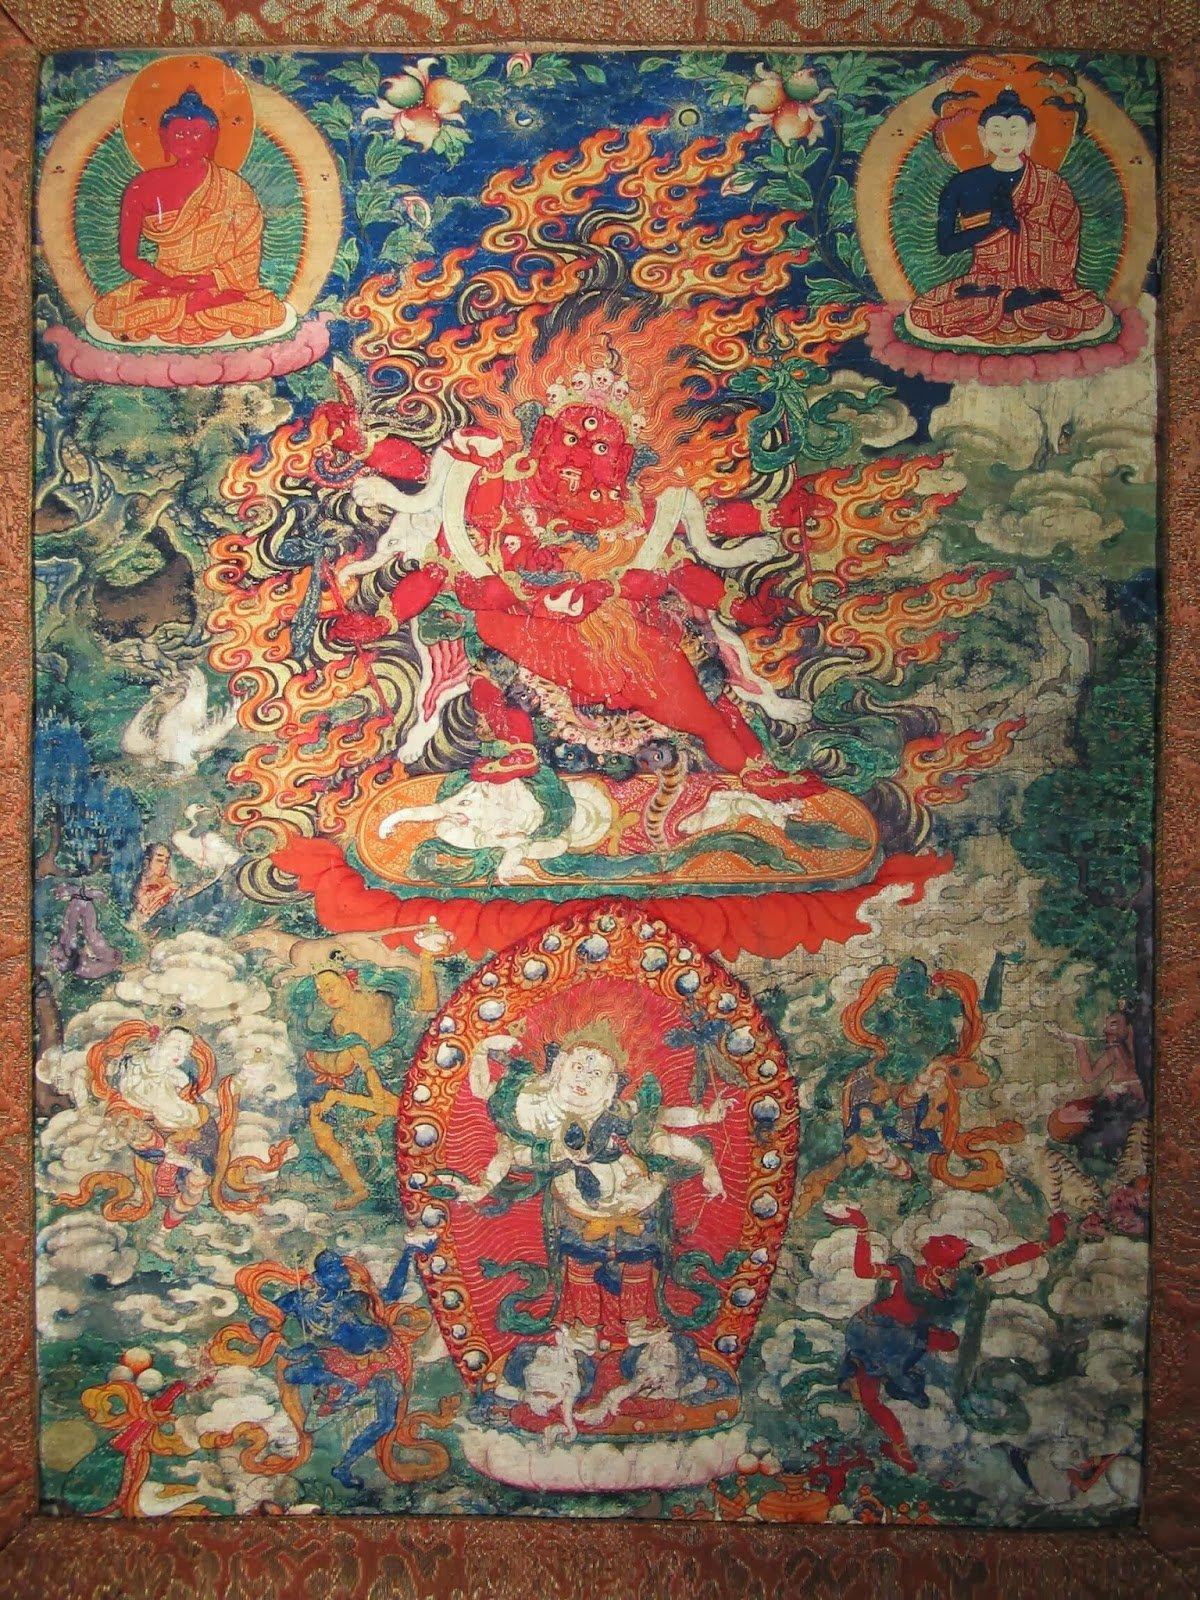 Hayagriva Secret Accomplishment and Vajravarahi his wisdom consort Buddha Weekly